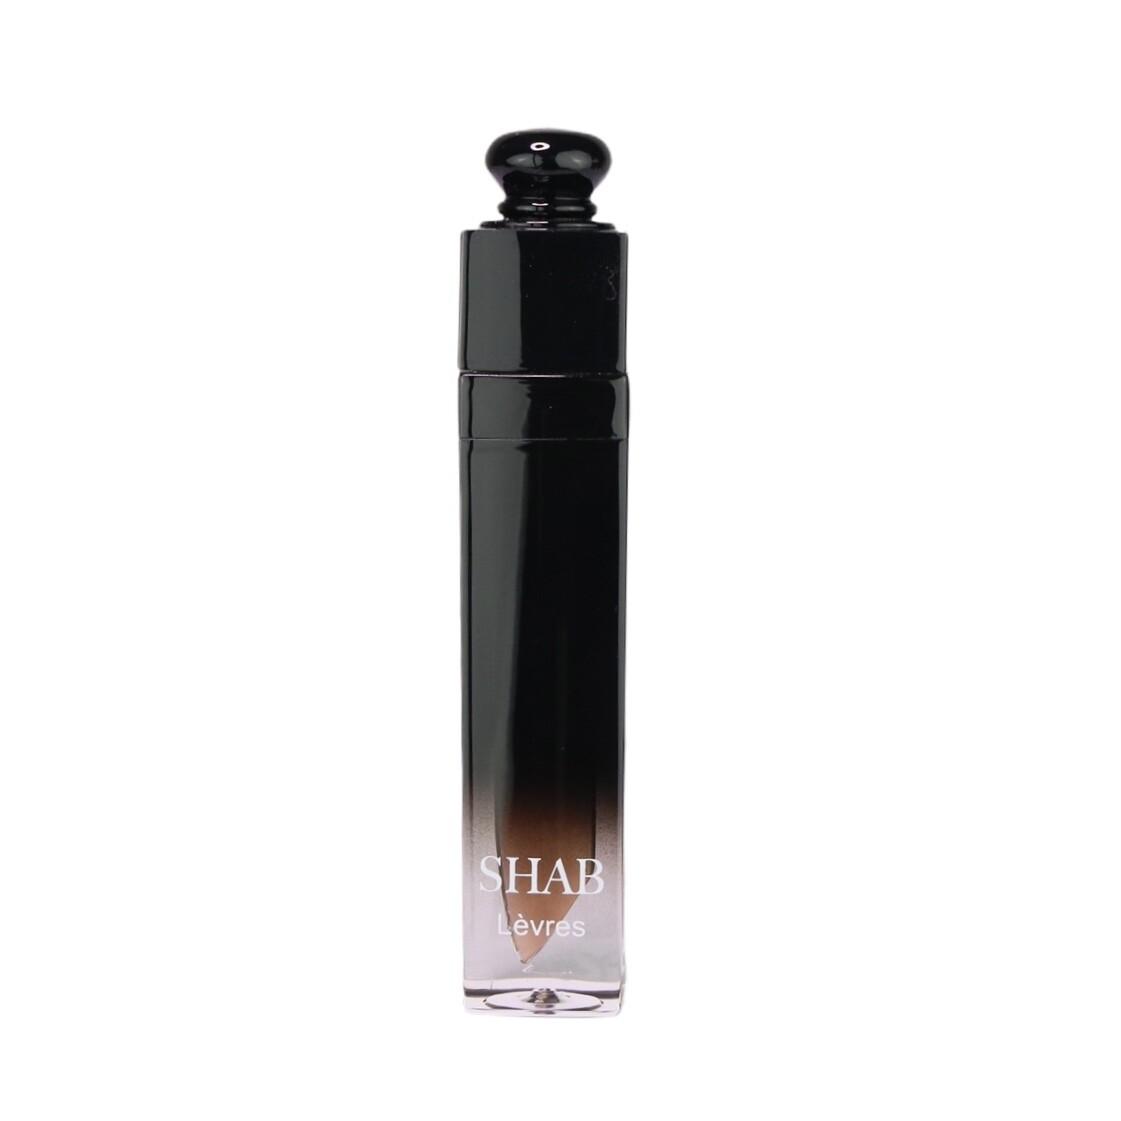 SHAB Lèvres Liquid Matte [Naughty nude]